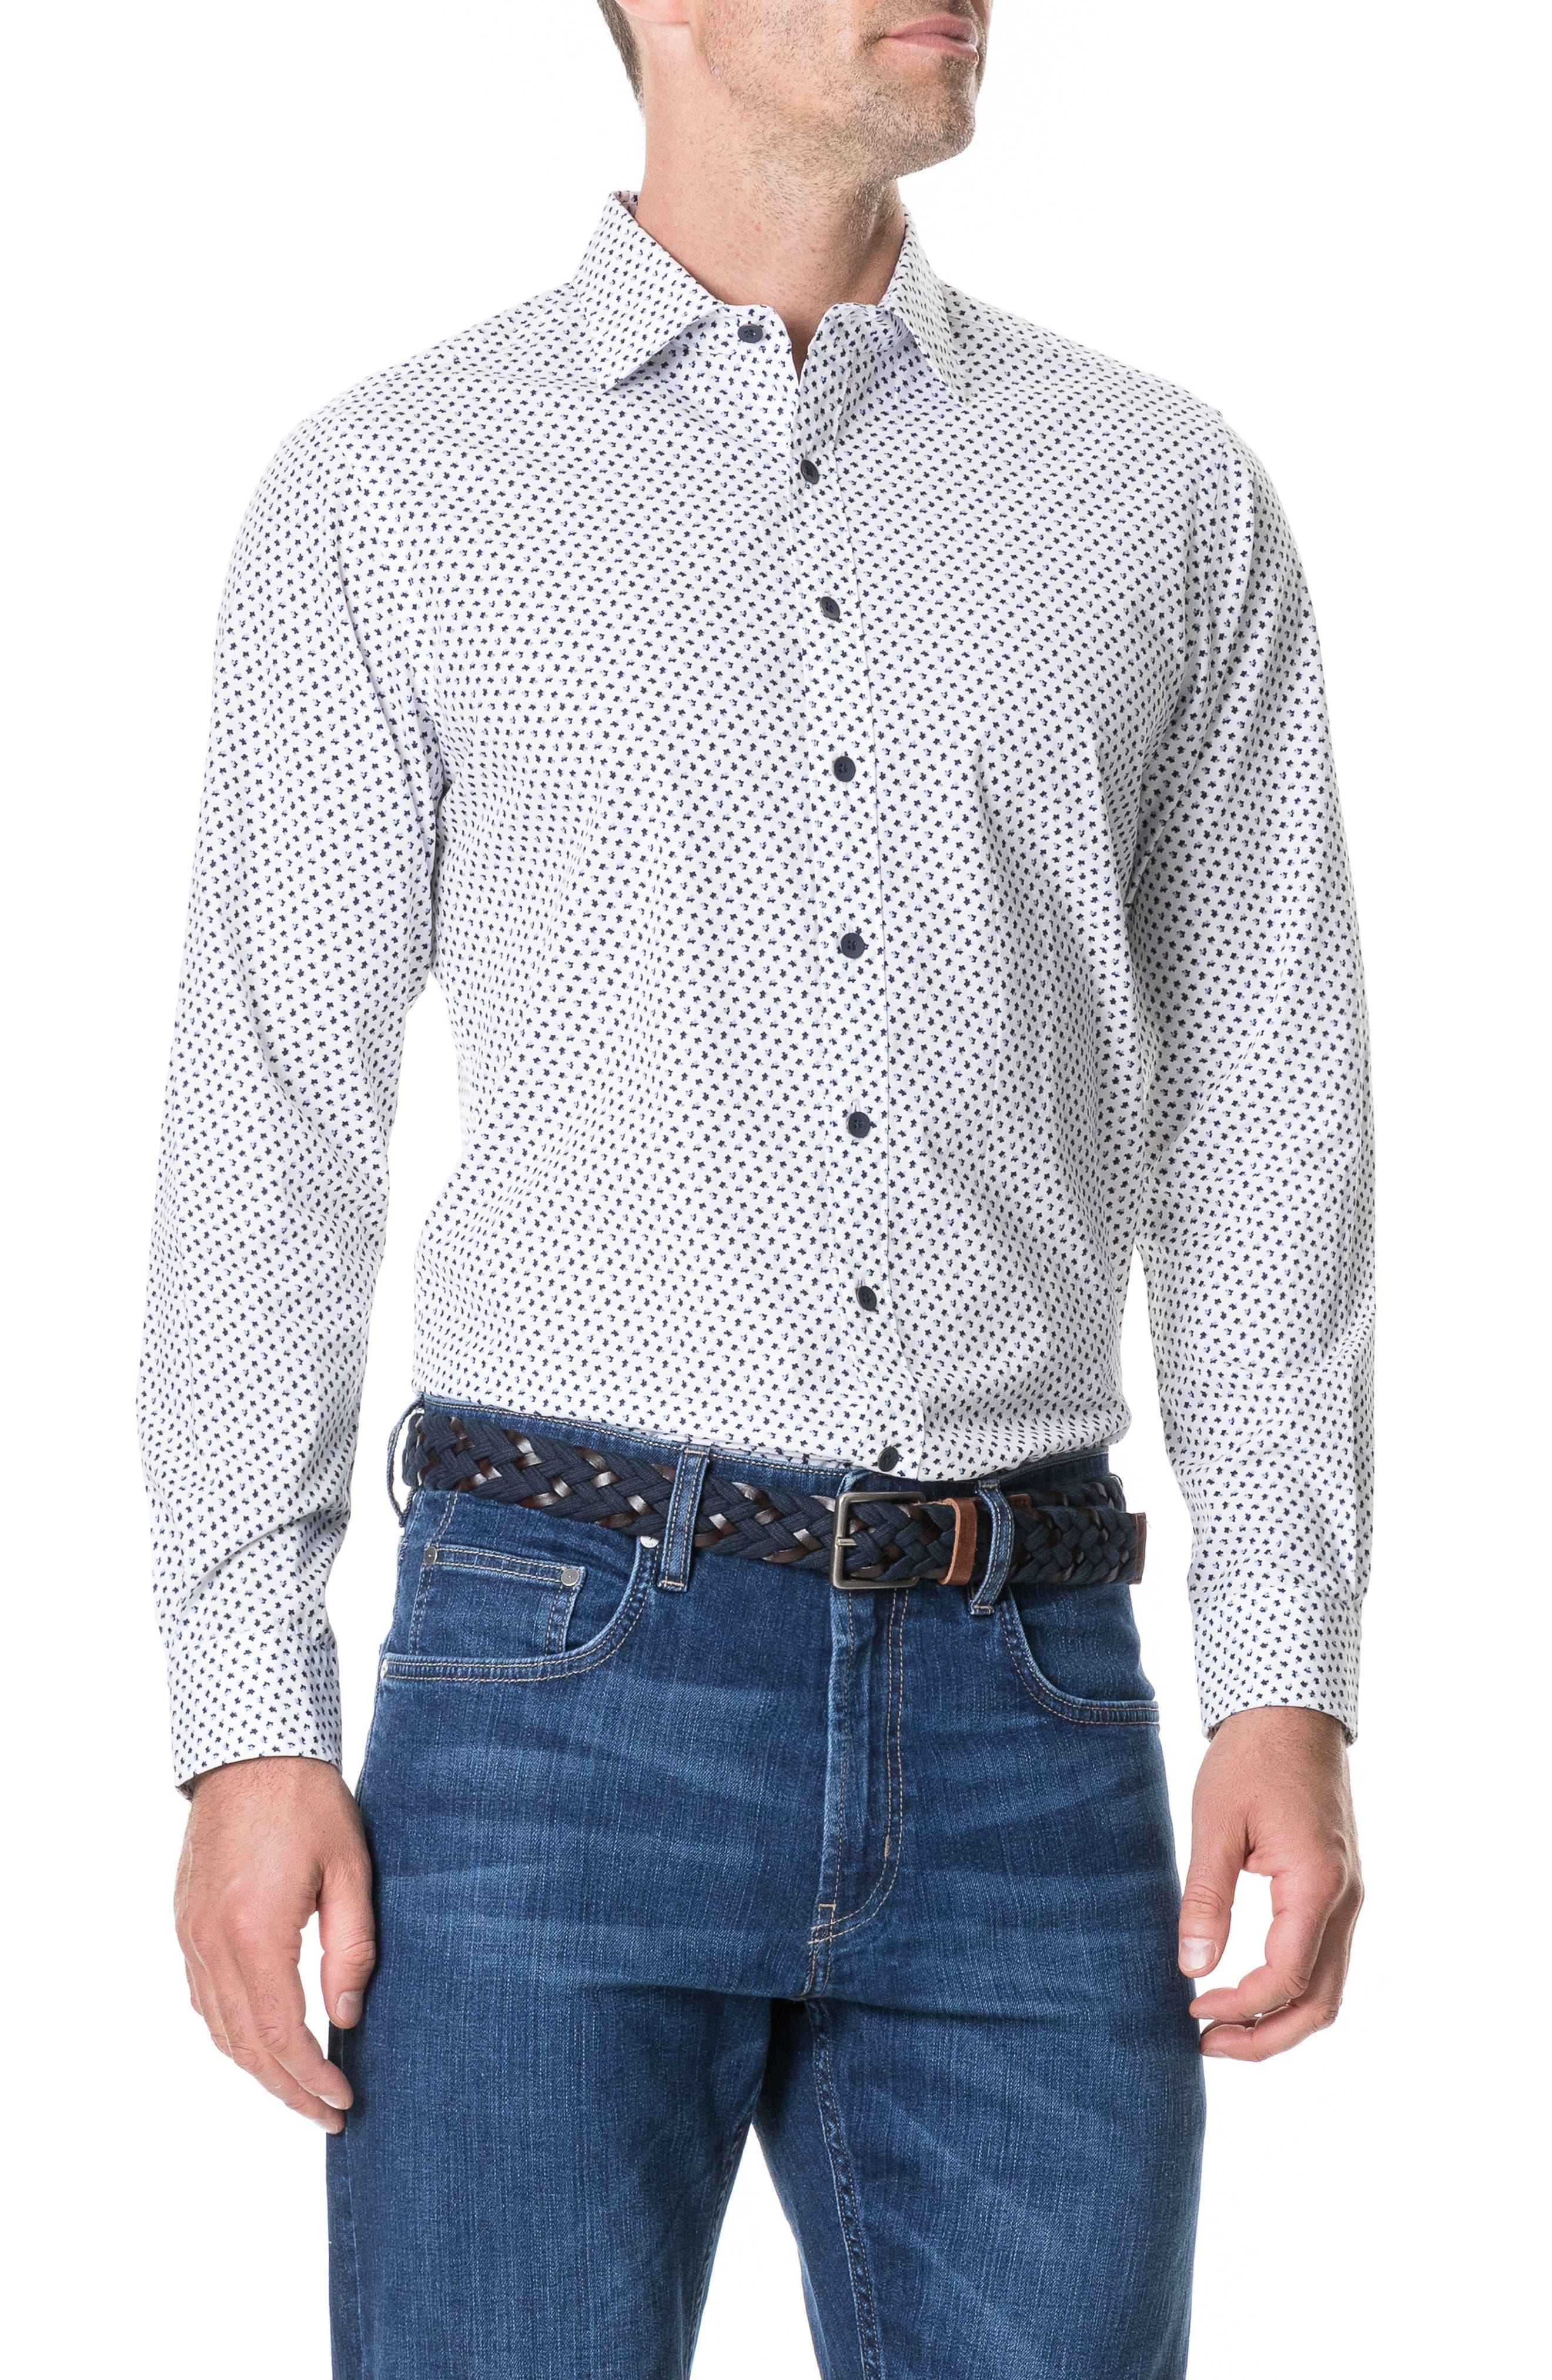 RODD & GUNN, Northcross Sport Shirt, Main thumbnail 1, color, IVORY